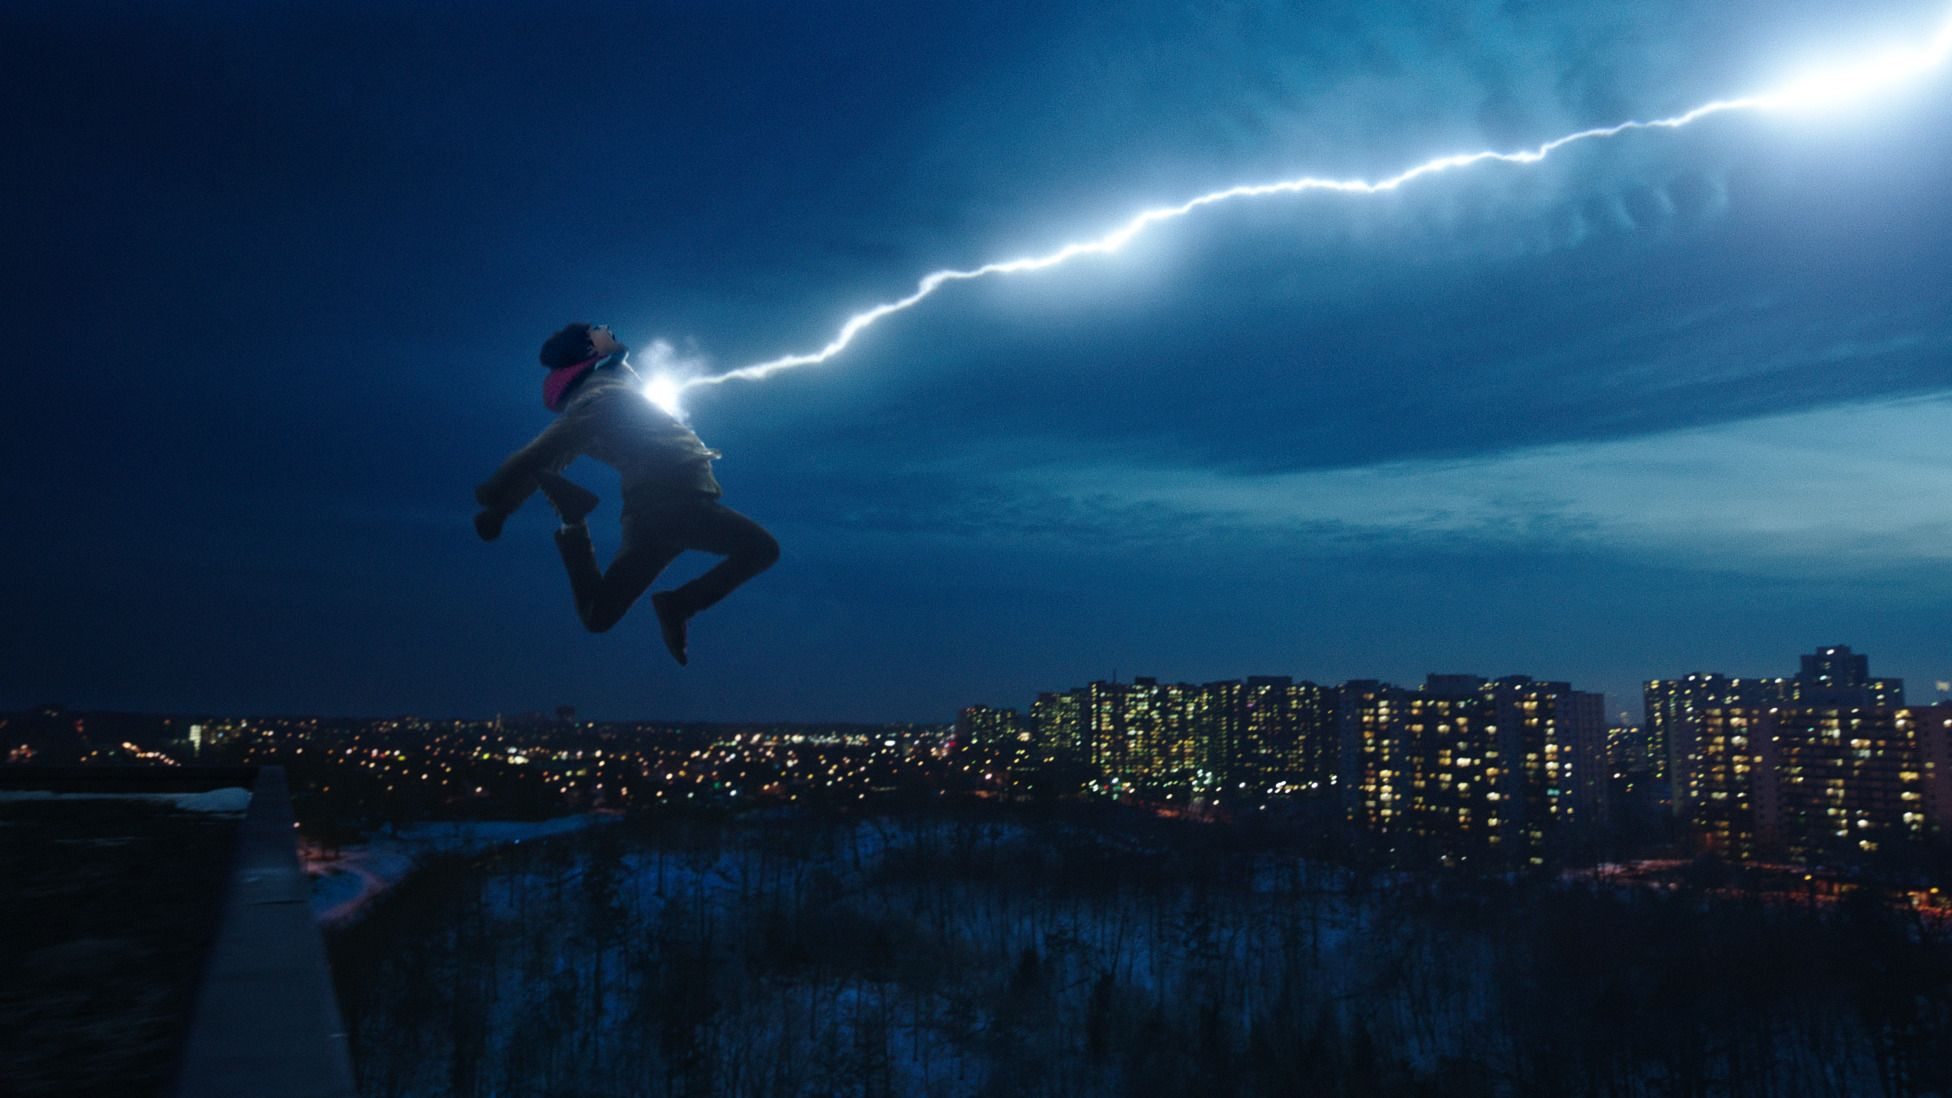 Friday Box Office: 'Shazam!' Thunders to $20.5 Million